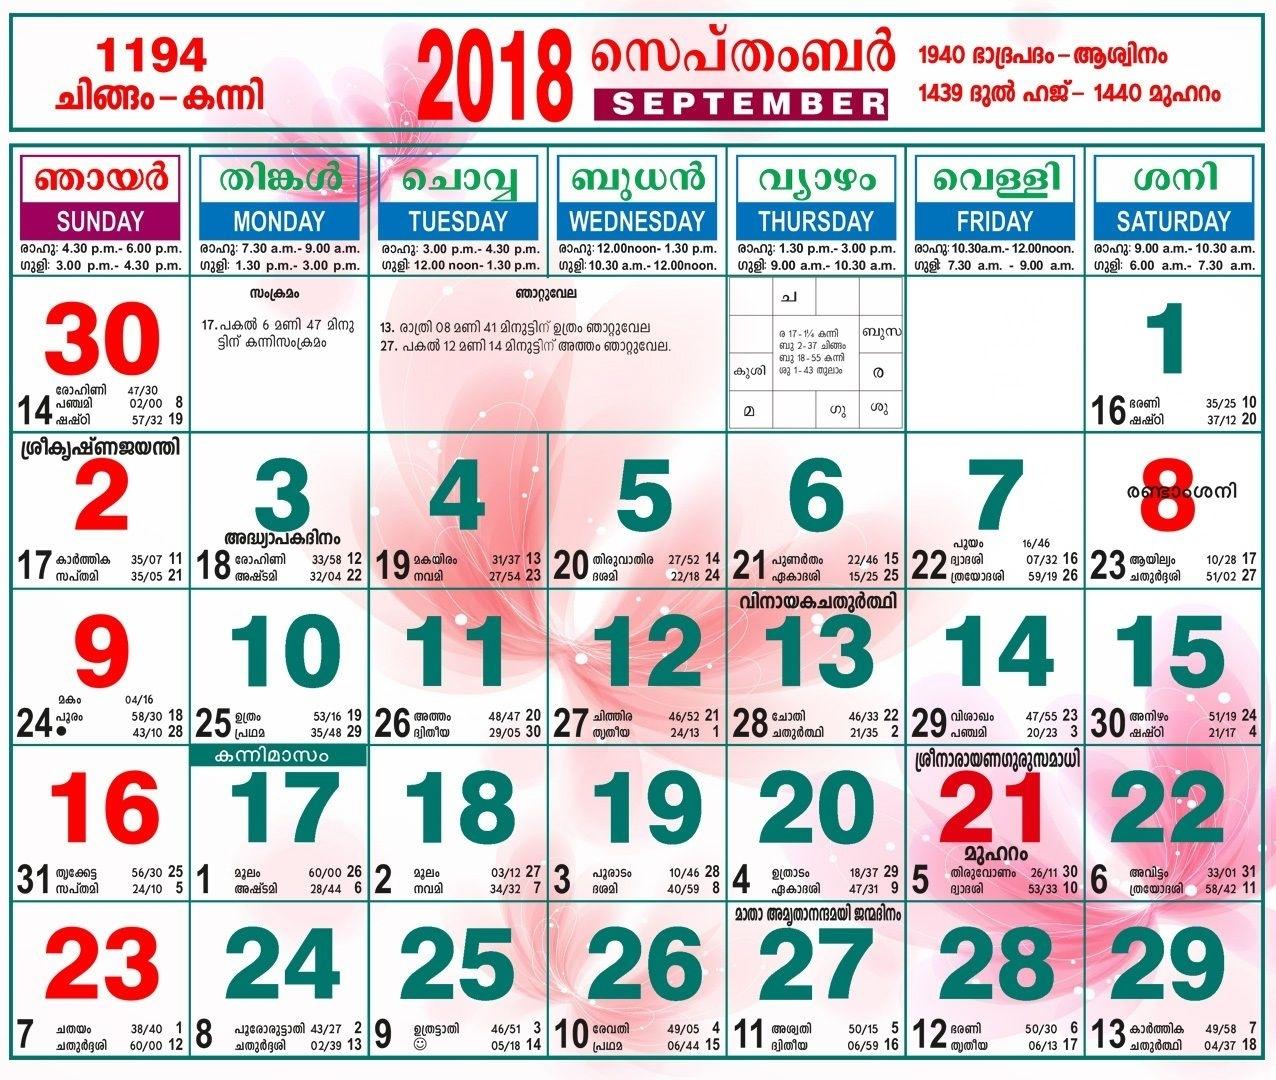 September 2018 Tamil Calendar Monthly Document   Tamil Calendar within Kerala September Holidays According To Calendar